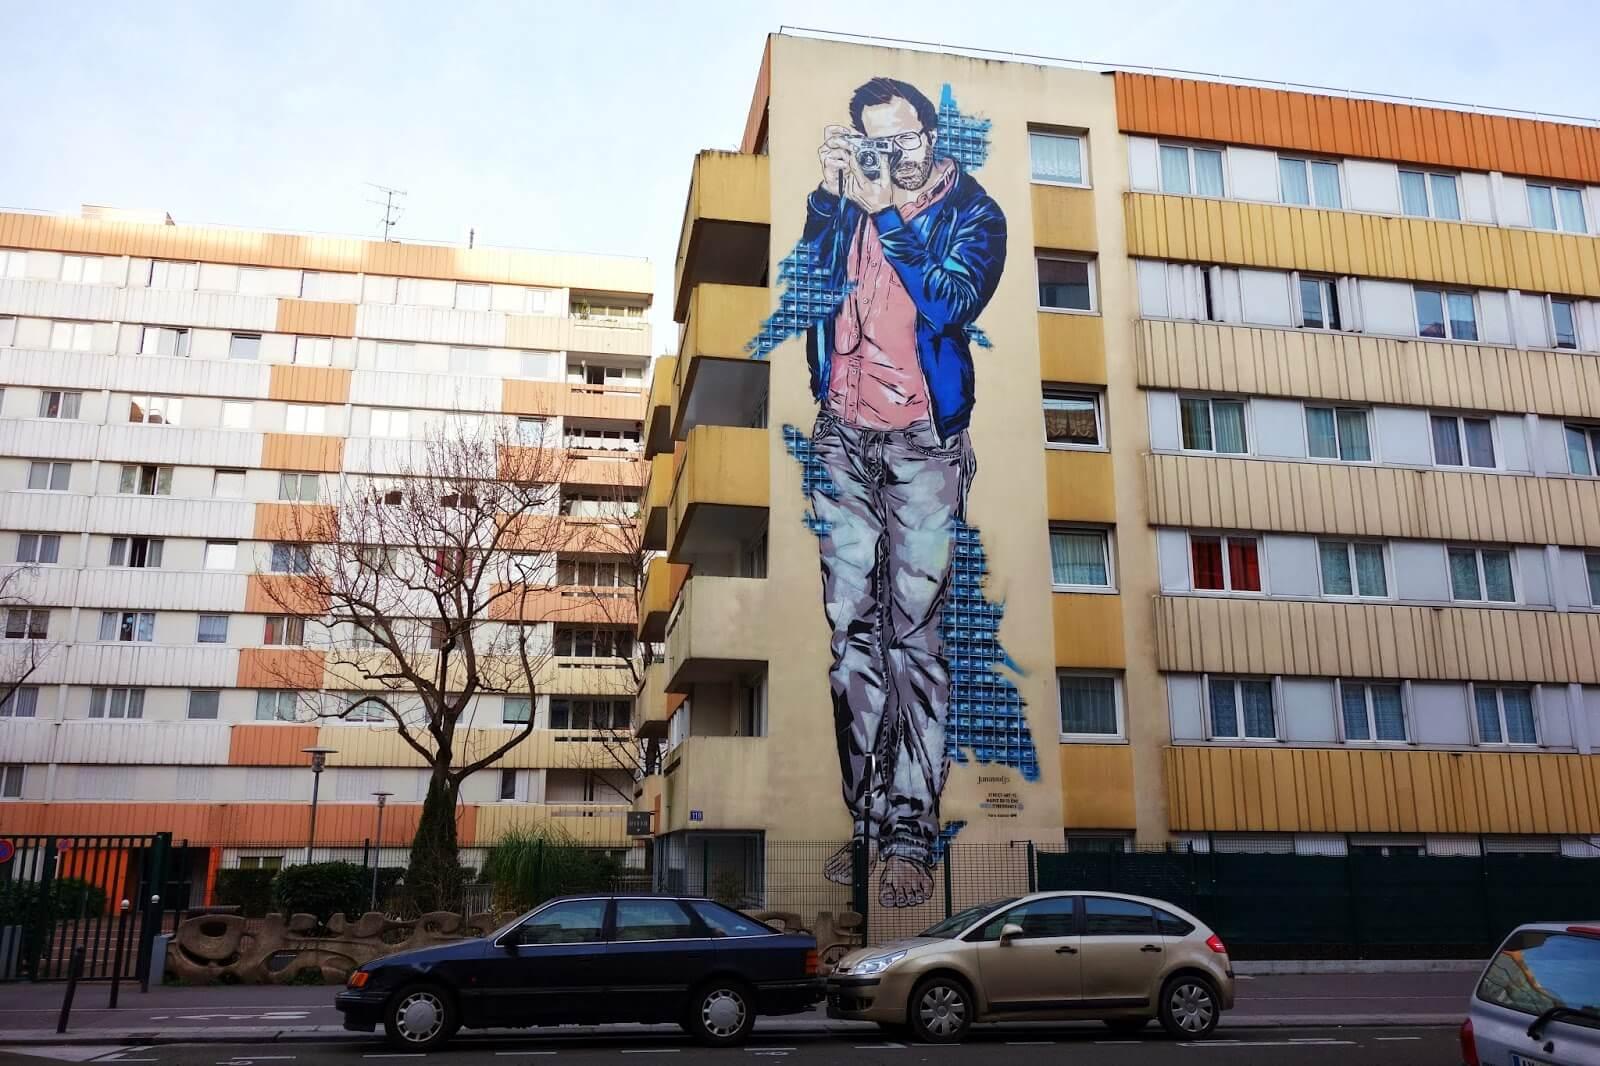 ou-voir-street-art-paris-rue-jeanne-darc2